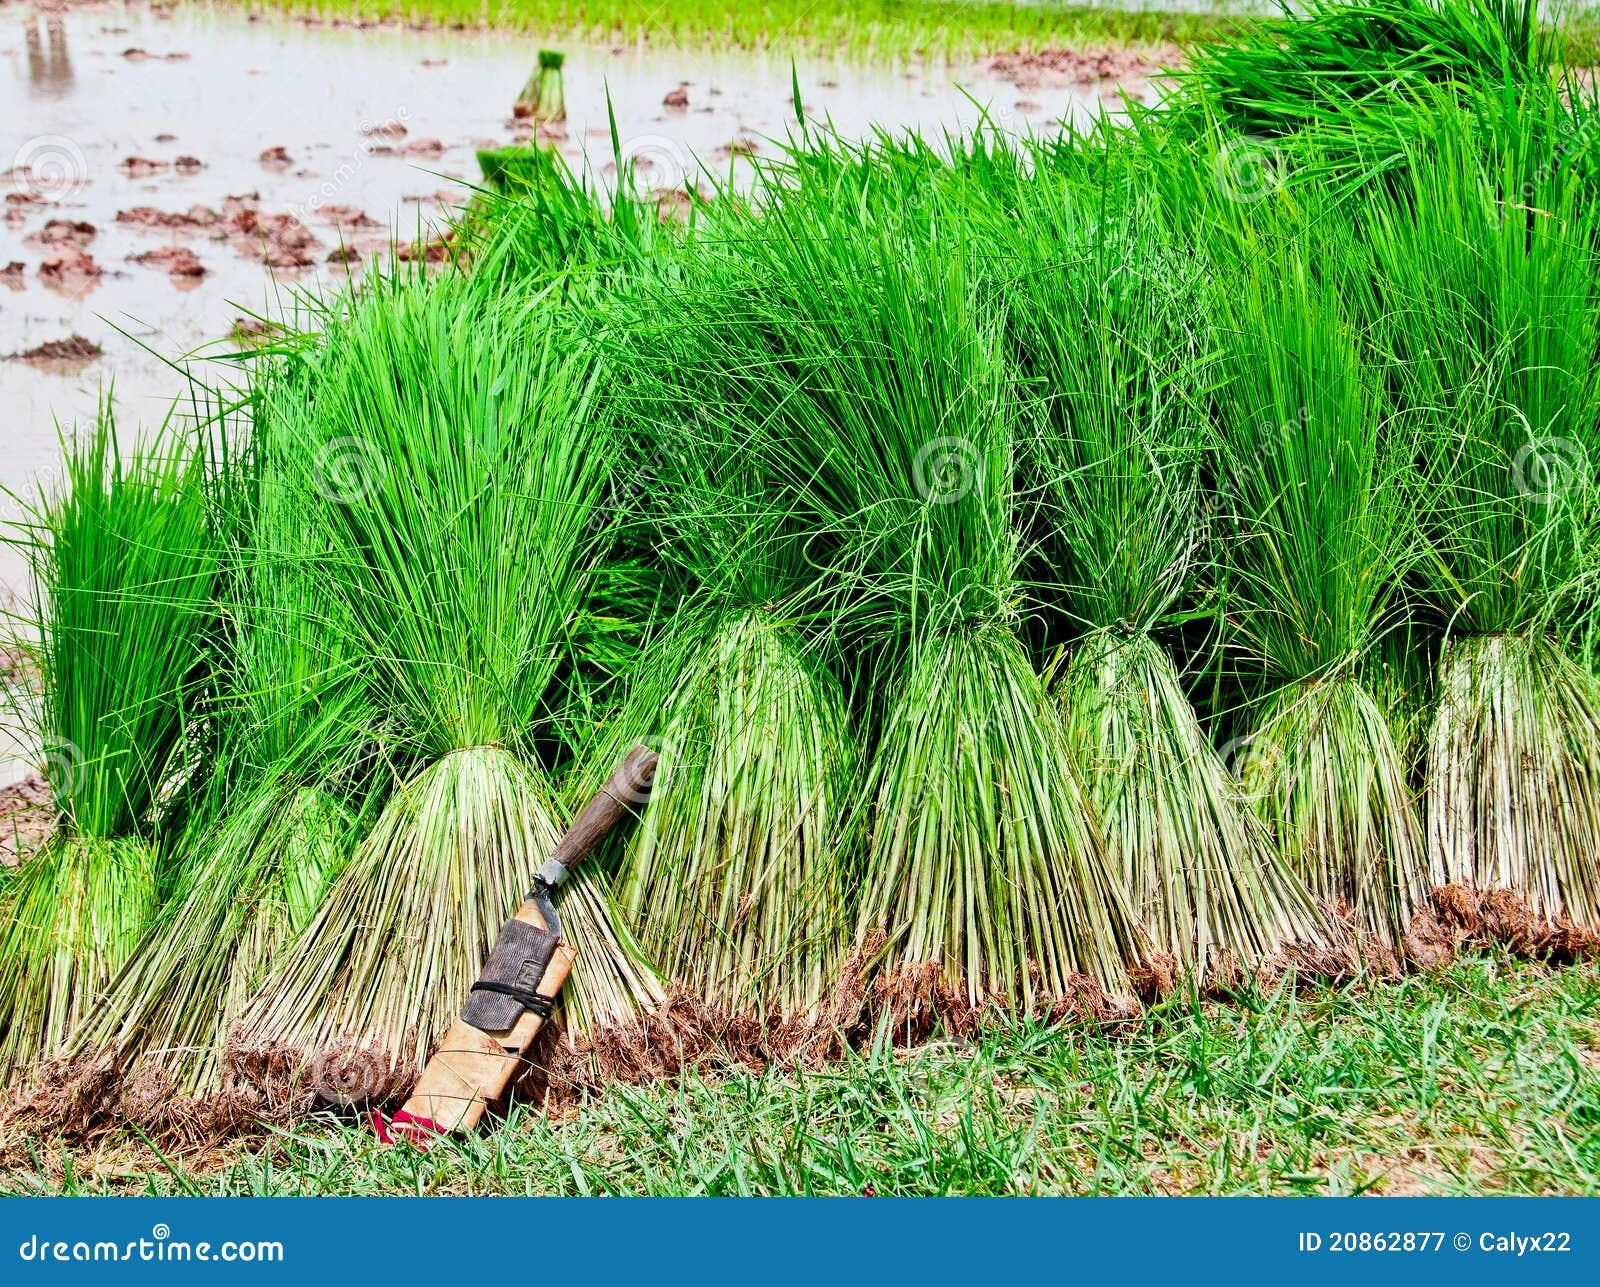 Huertos Y Vegetales: www.pinterest.com/pin/516365913504976786